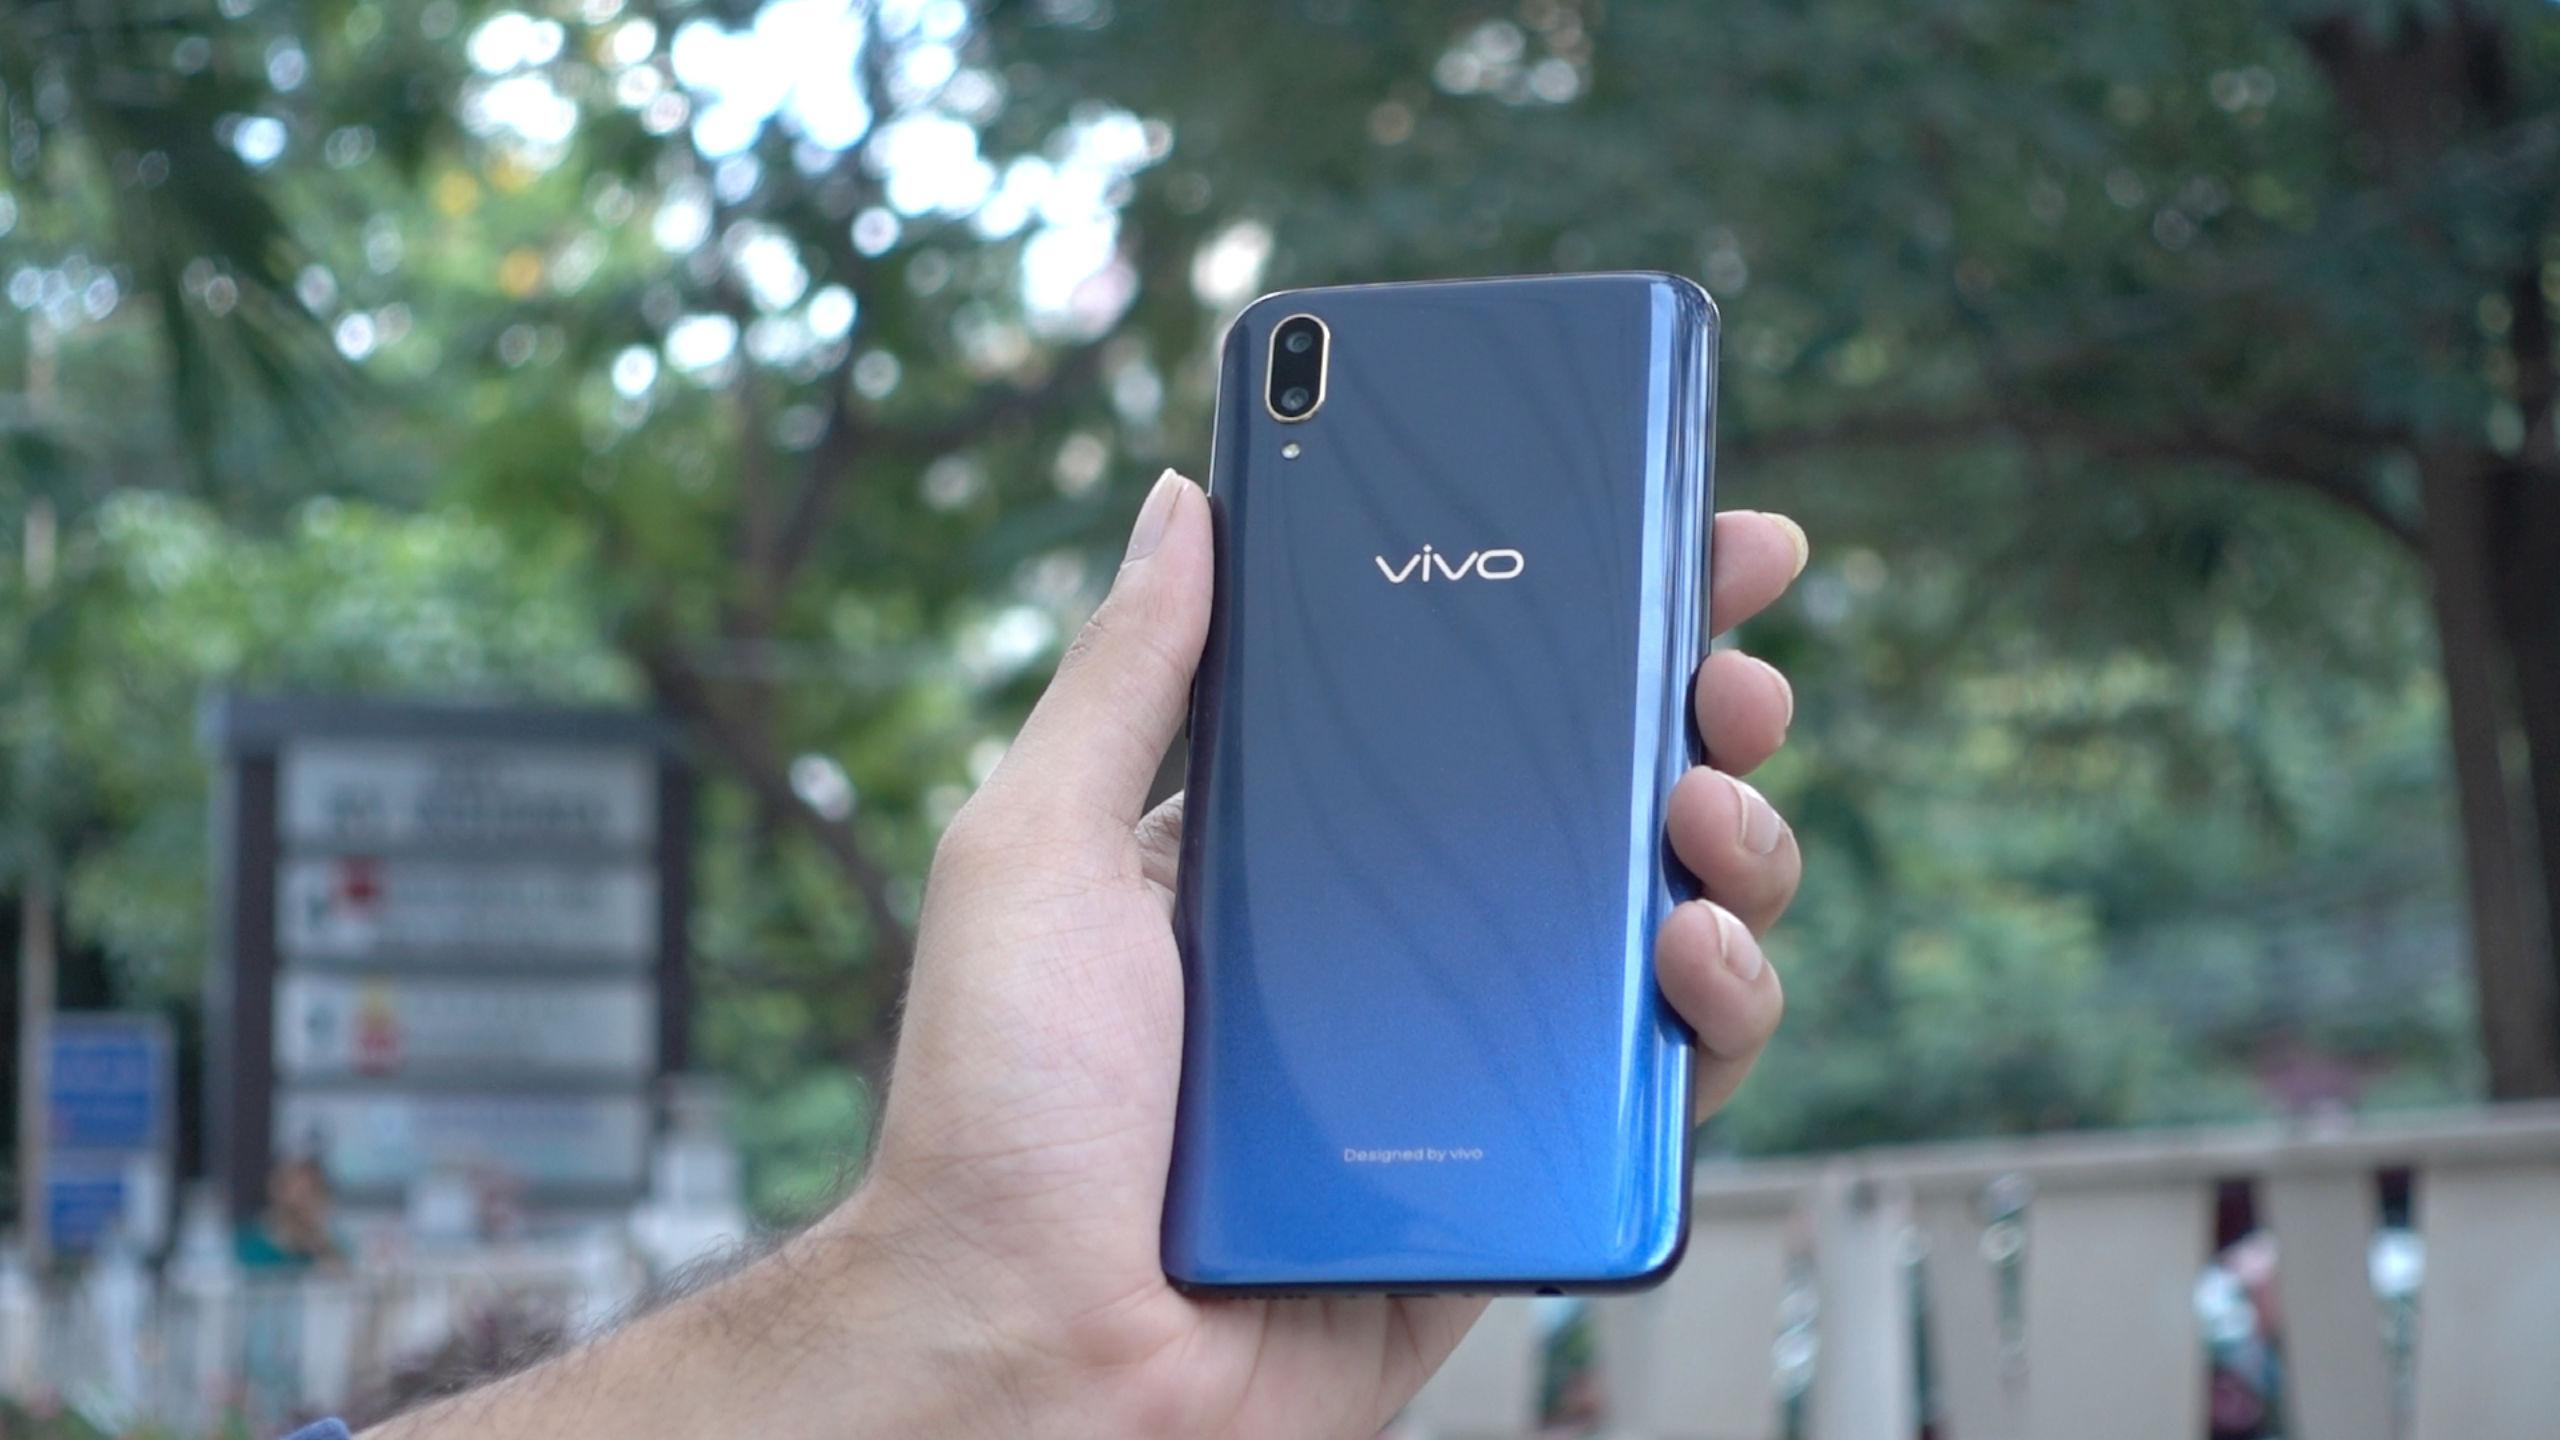 OPPO F9 Pro vs Vivo V11 Pro Mid-range Android Phones Face